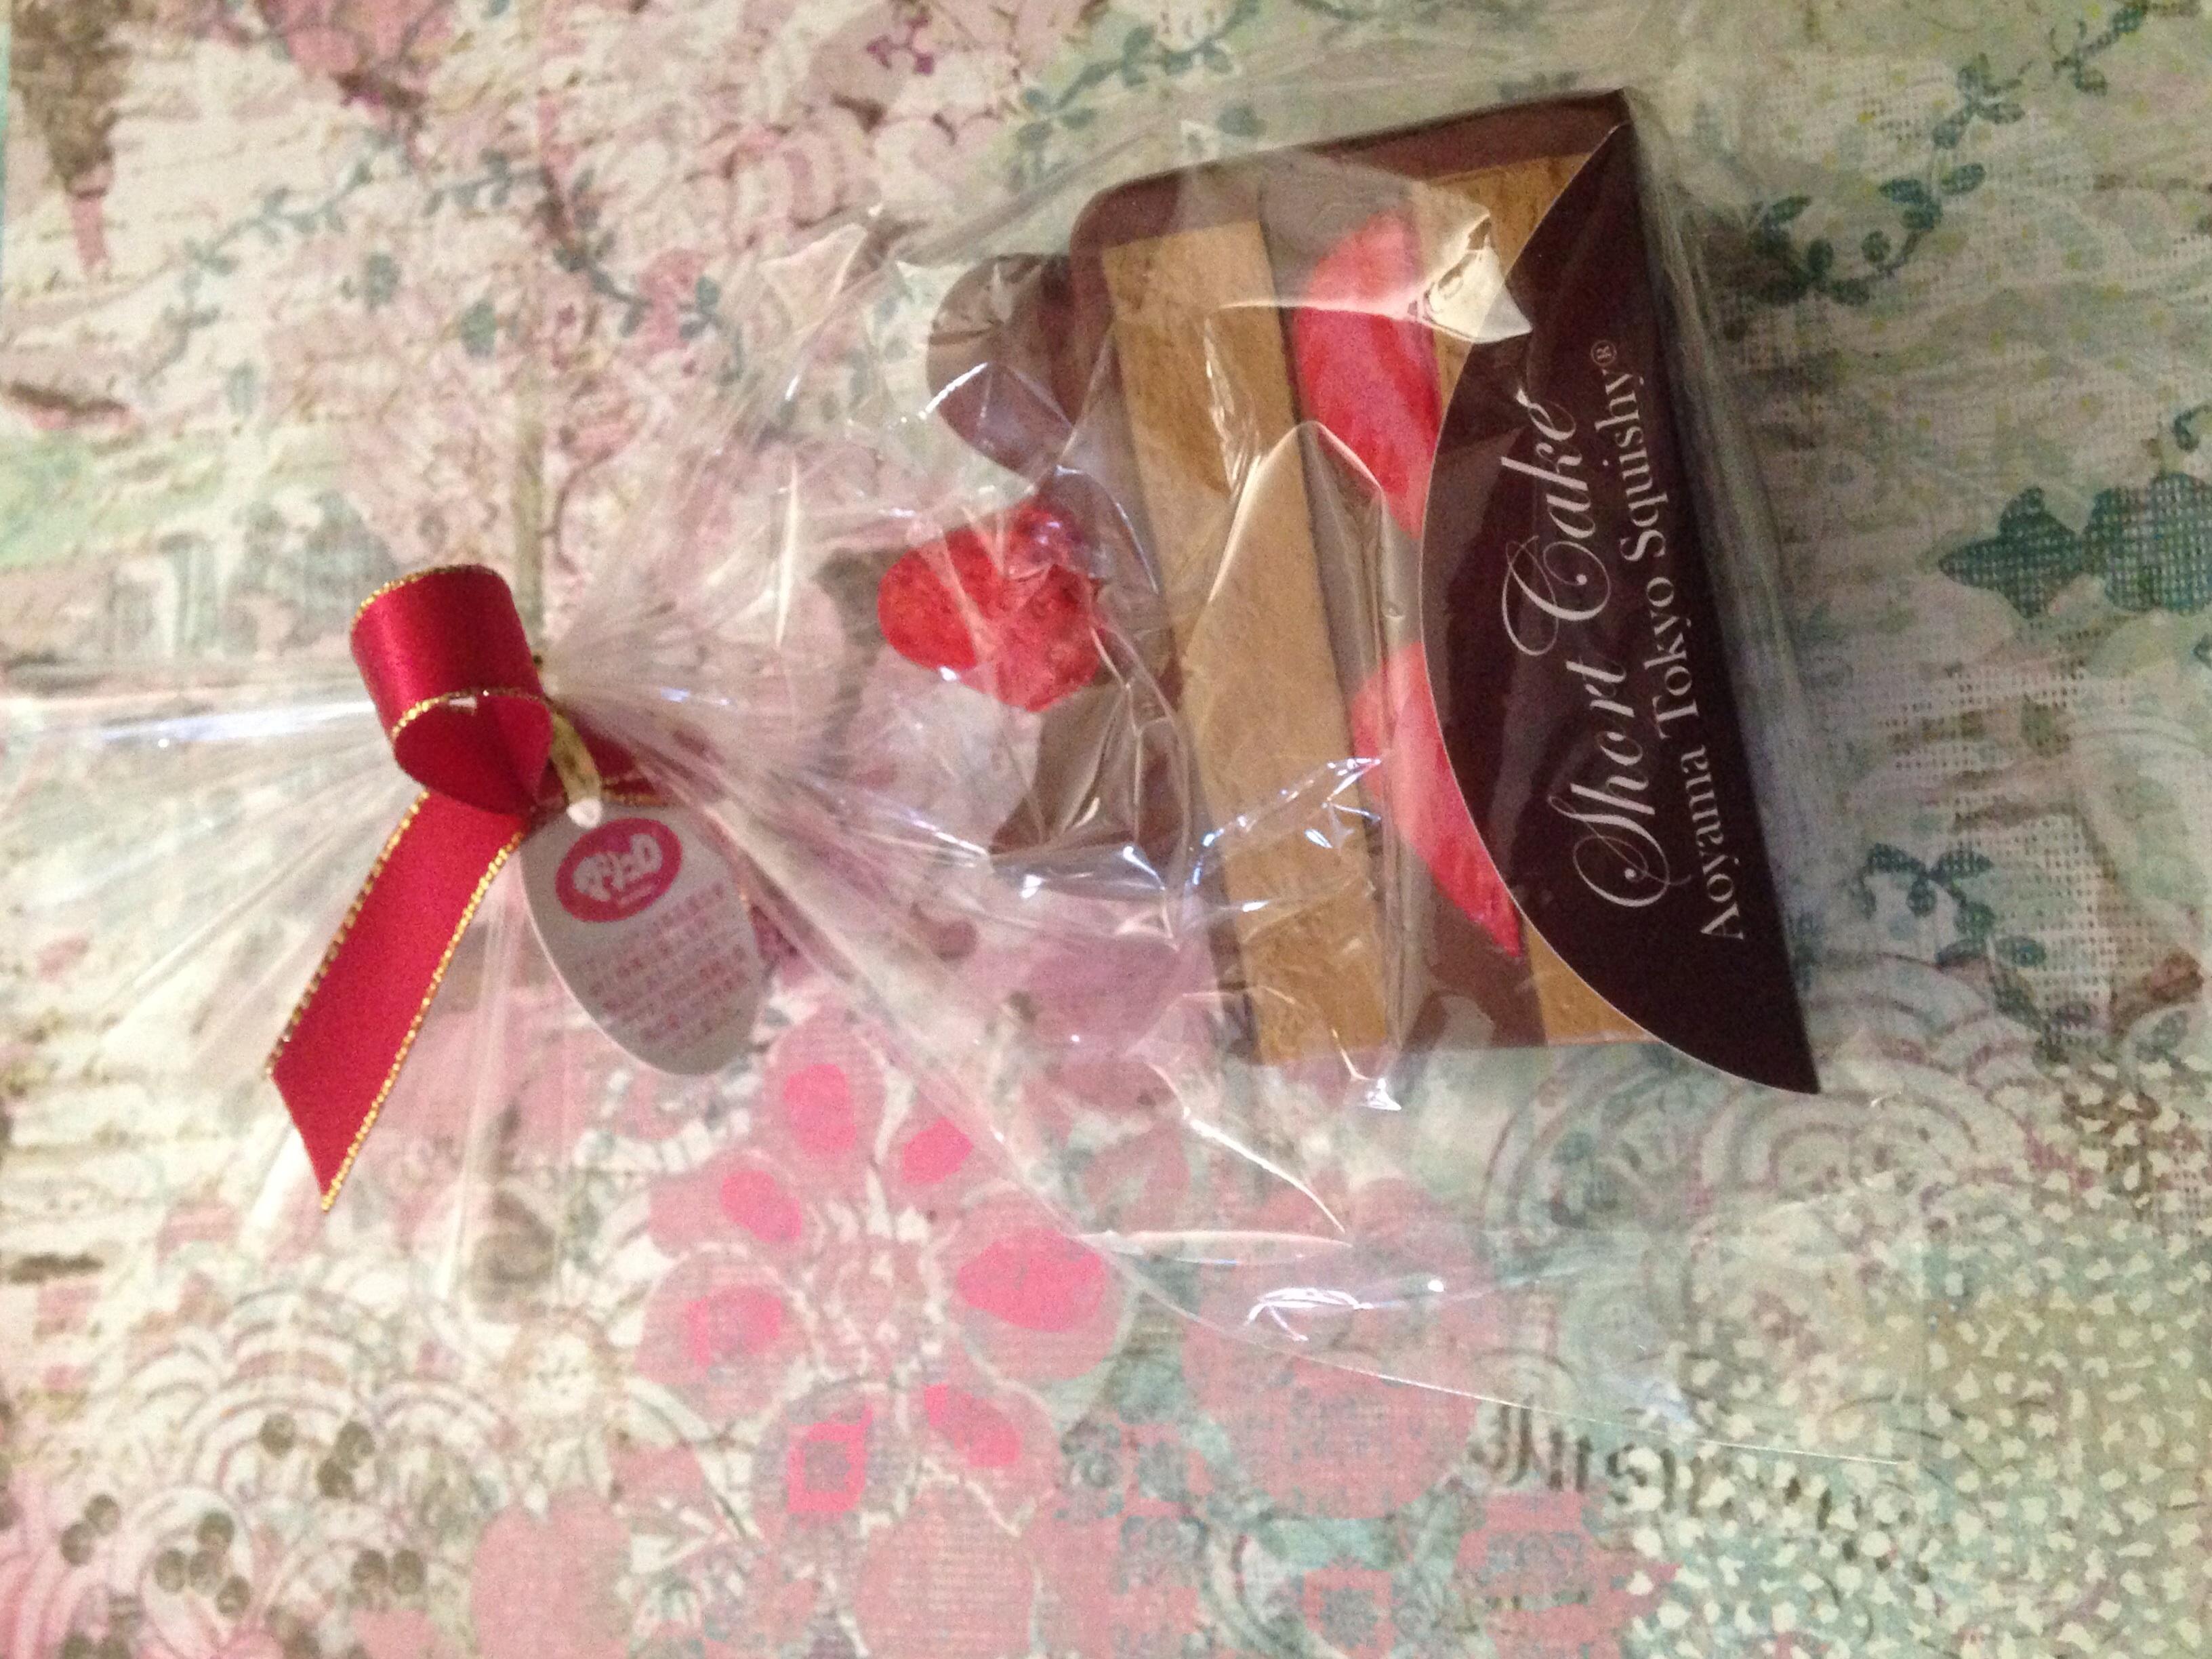 Squishy Cake Ibloom : Rare ibloom cake squishy ? SuzyCupcake ? Online Store Powered by Storenvy